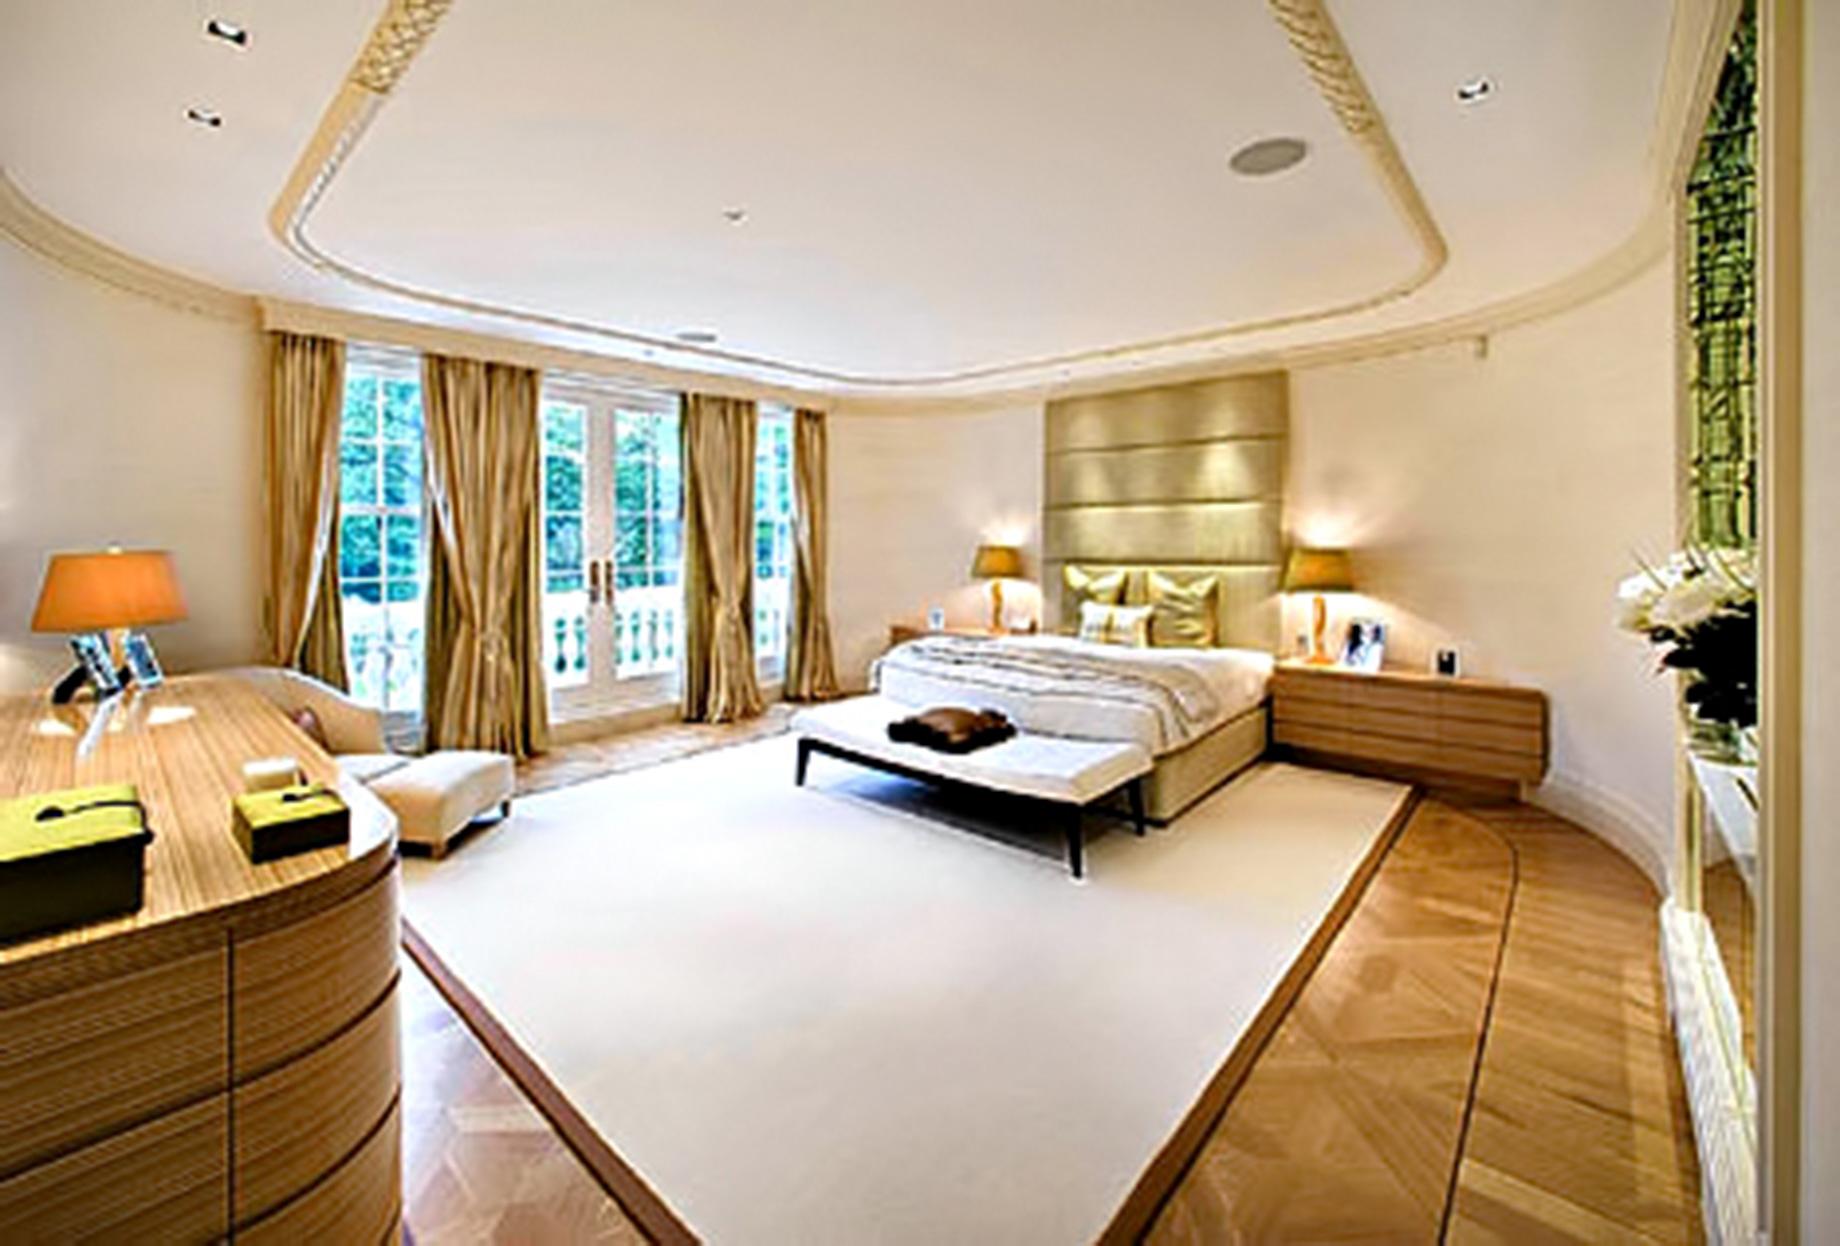 Résidence Palladio de Lev Leviev – Compton Ave, Highgate, Londres, Angleterre, Royaume-Uni